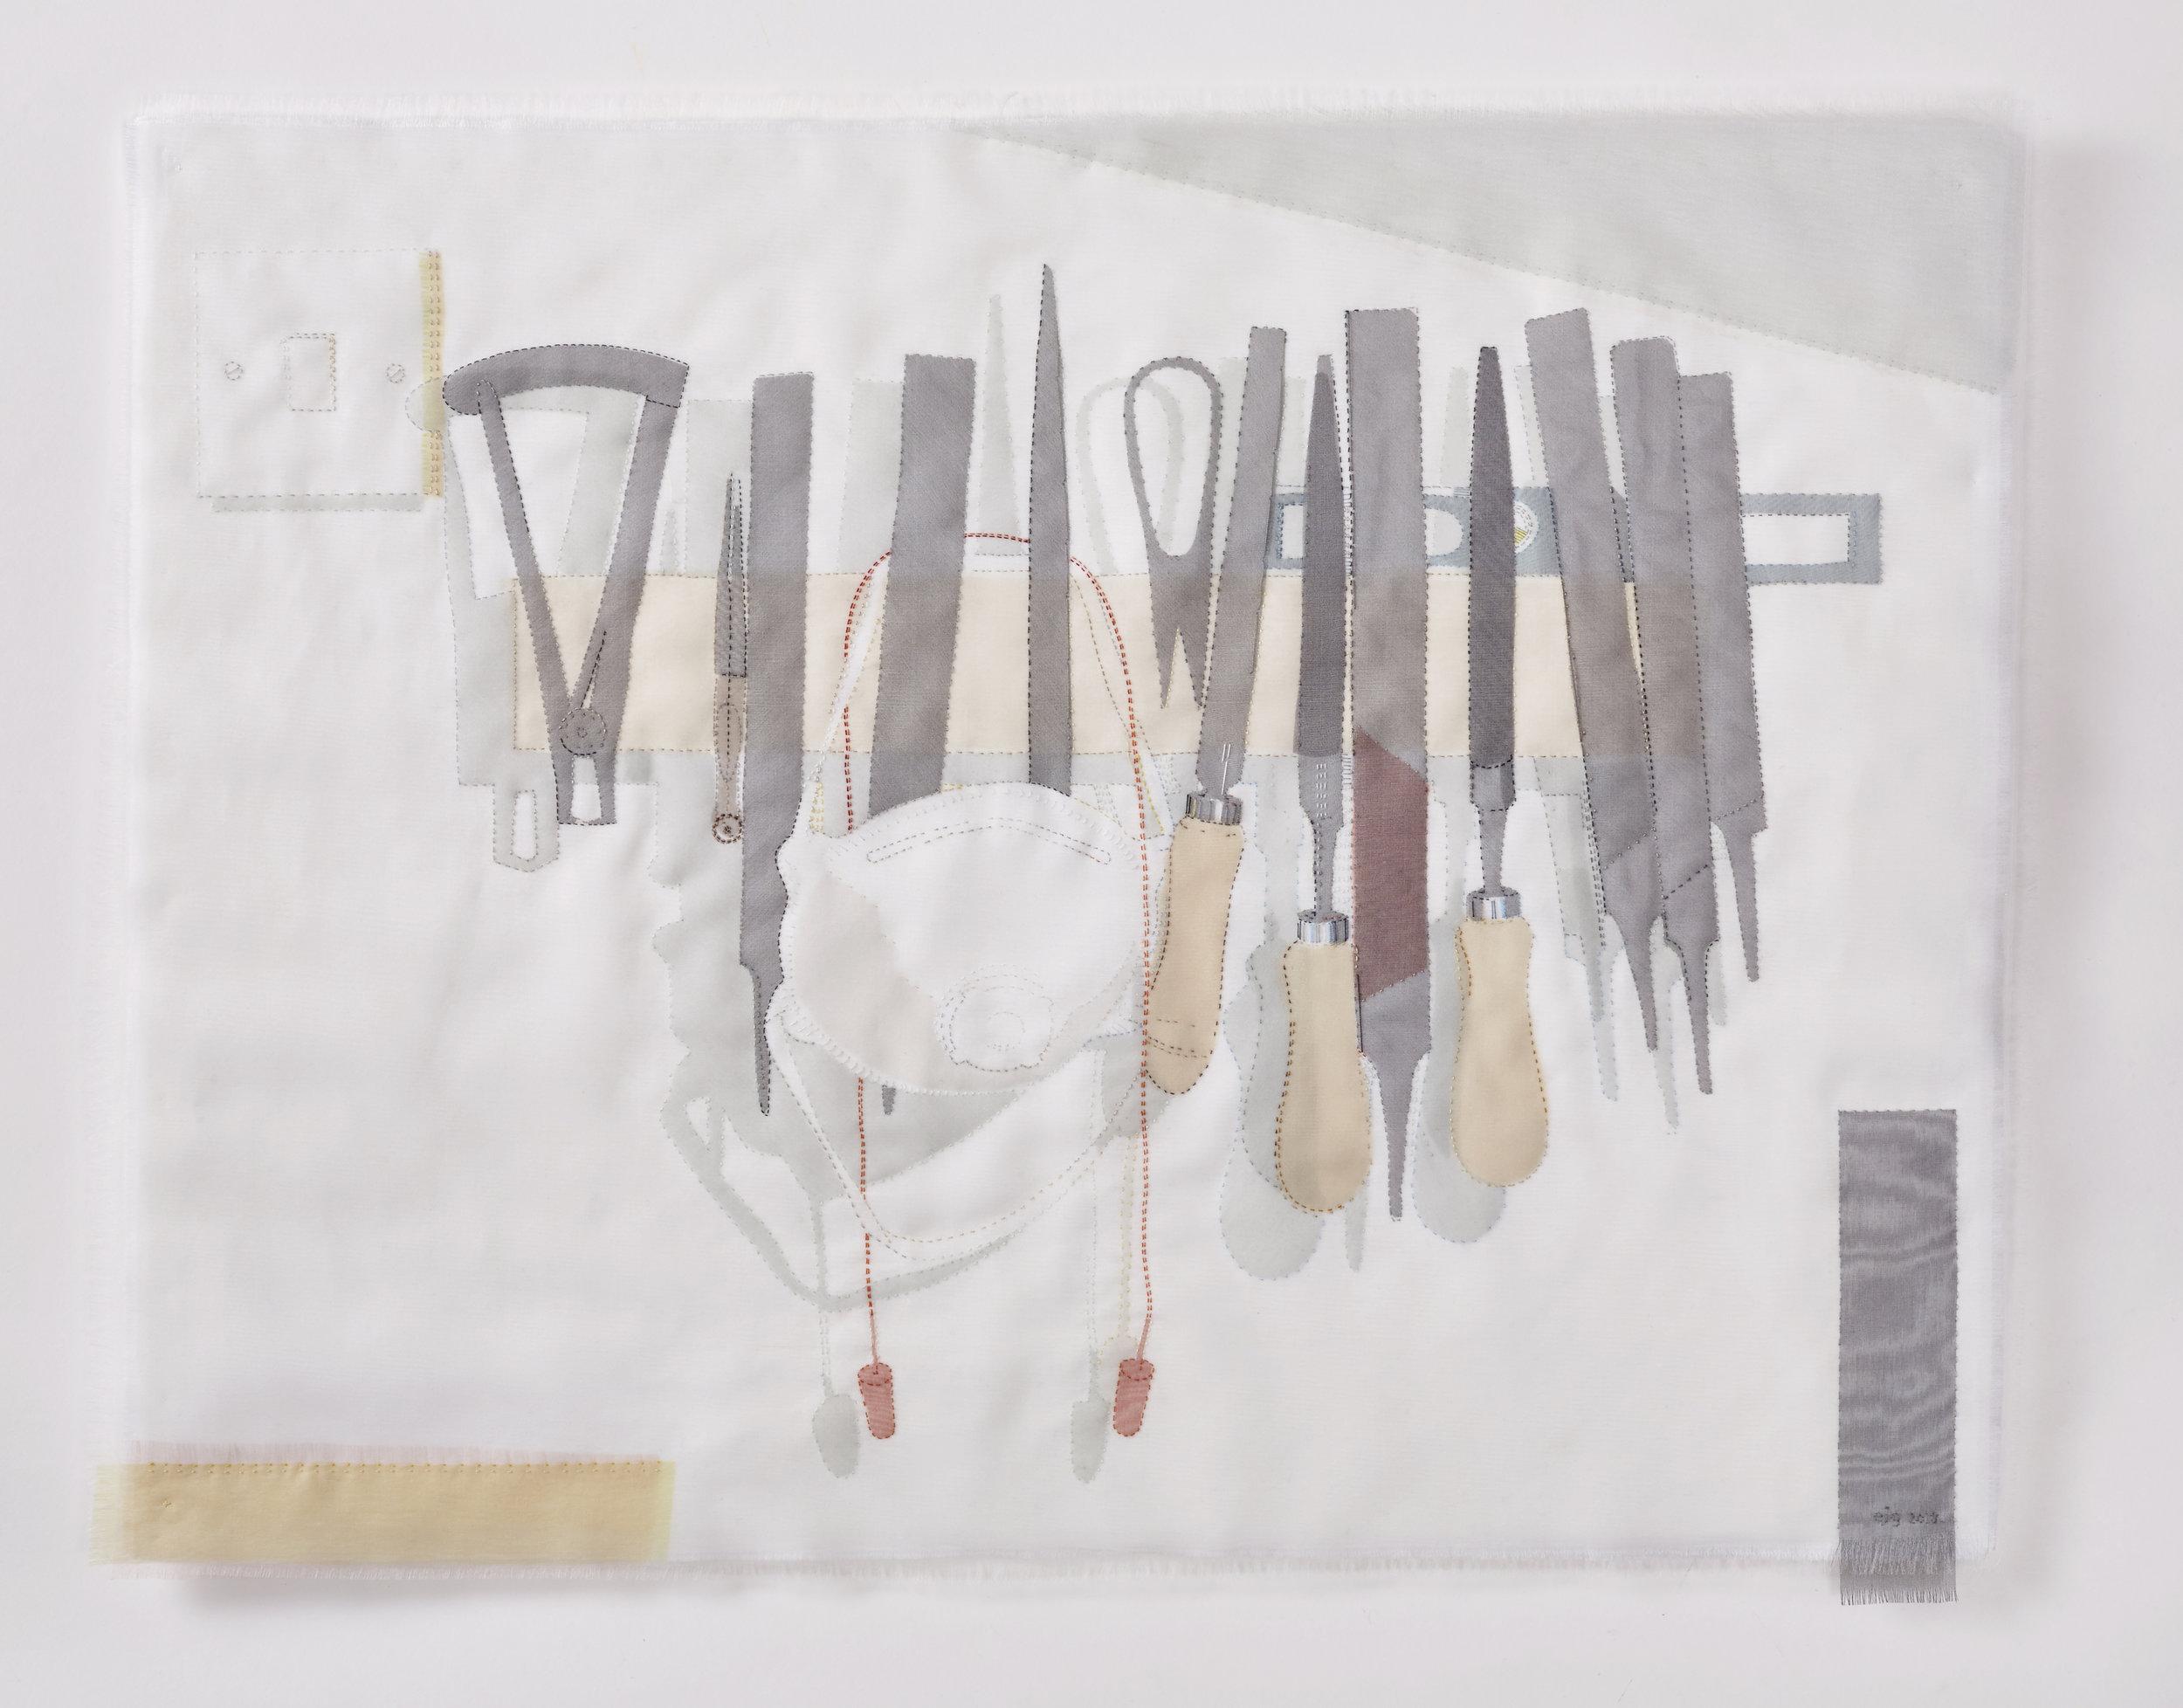 Portrait of a Metal worker 2017, 63cm x 49cm, hand stitched silk organza appliqué on linen. AVAILABLE  please enquire